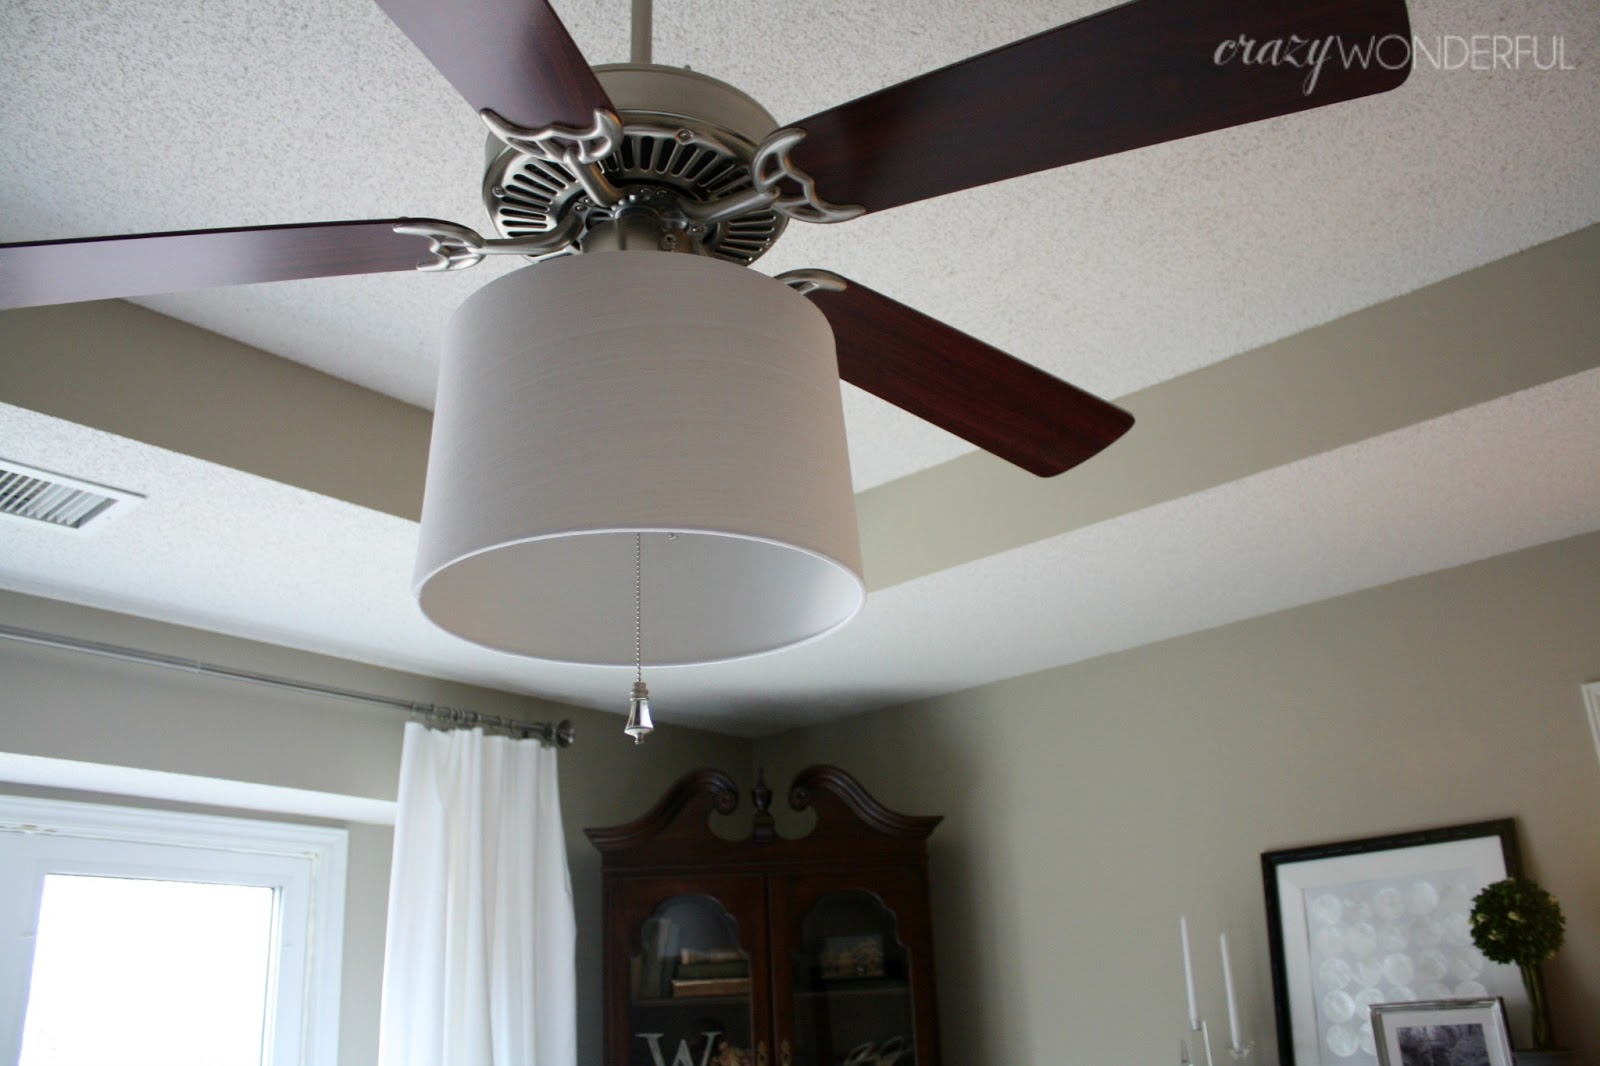 Adding A Drum Shade To A Ceiling Fan Crazy Wonderful